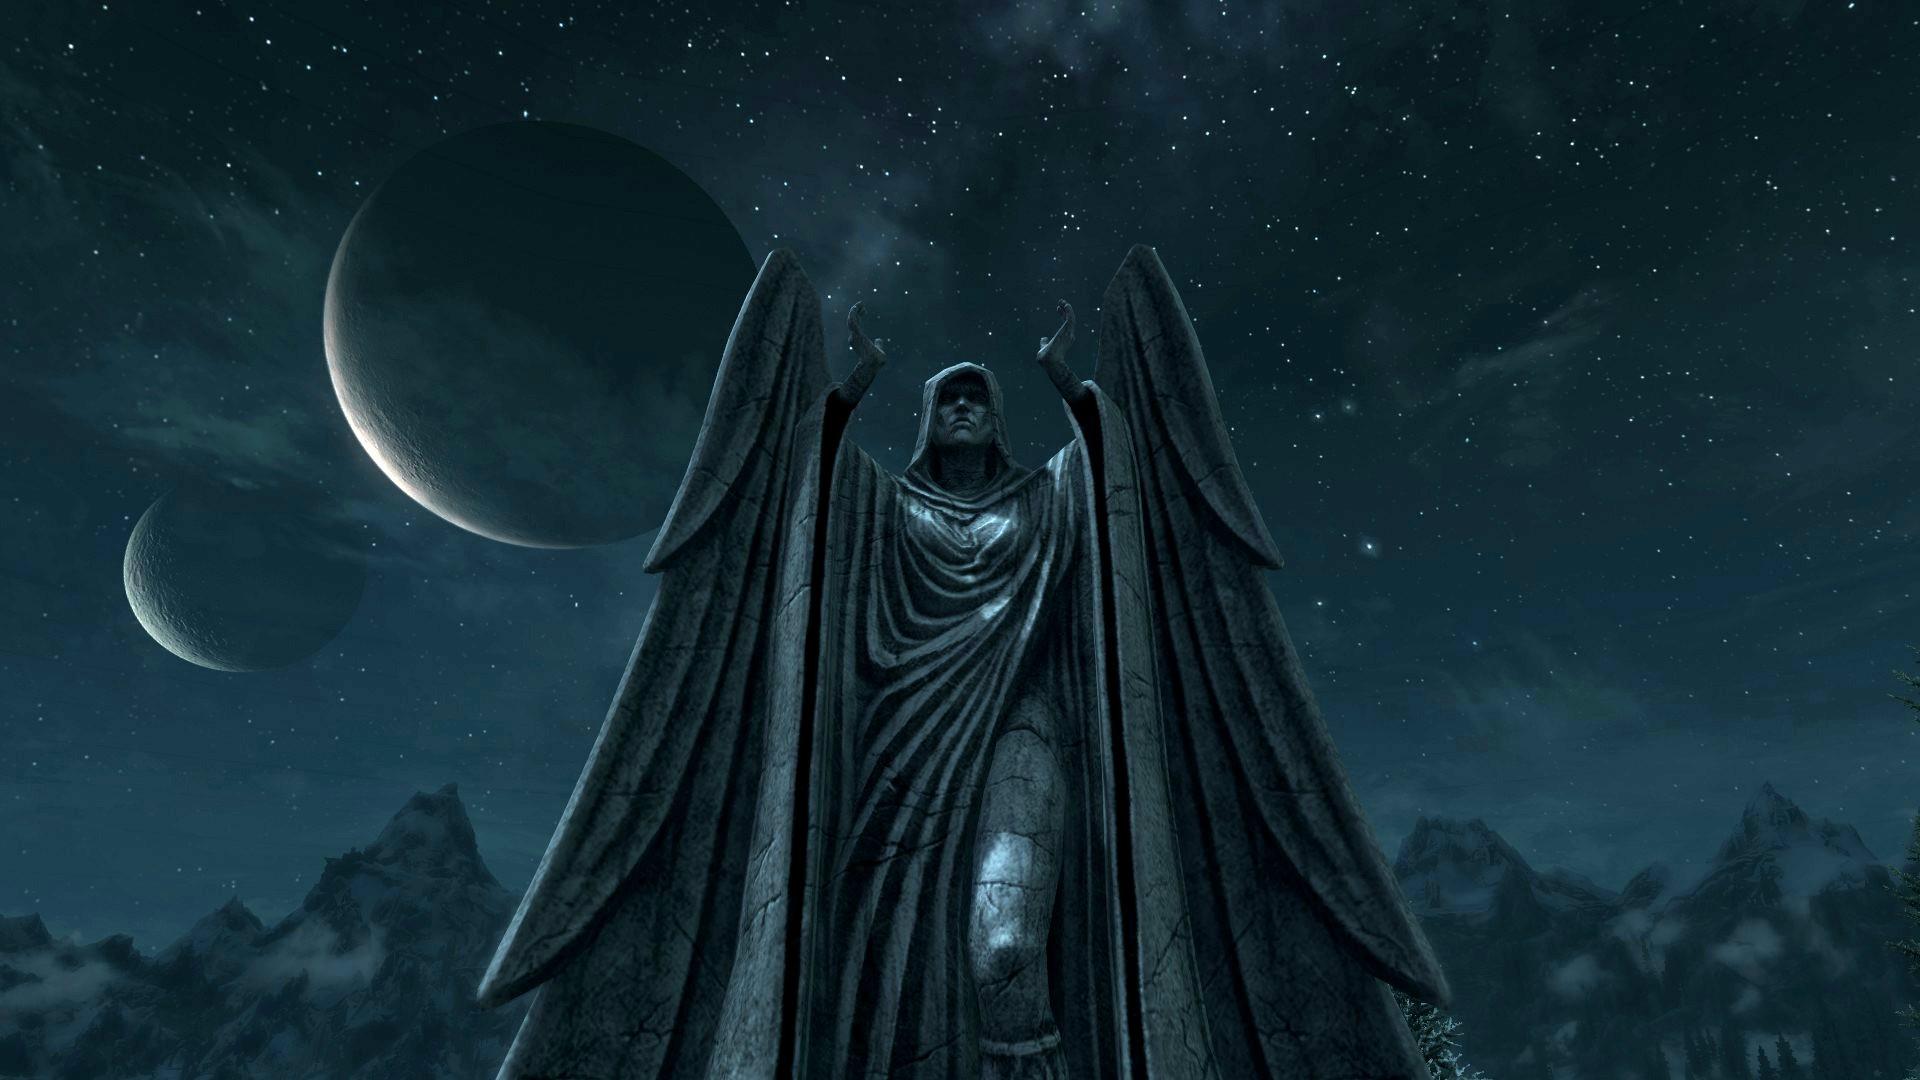 Res: 1920x1080, Video Game - The Elder Scrolls V: Skyrim Wallpaper